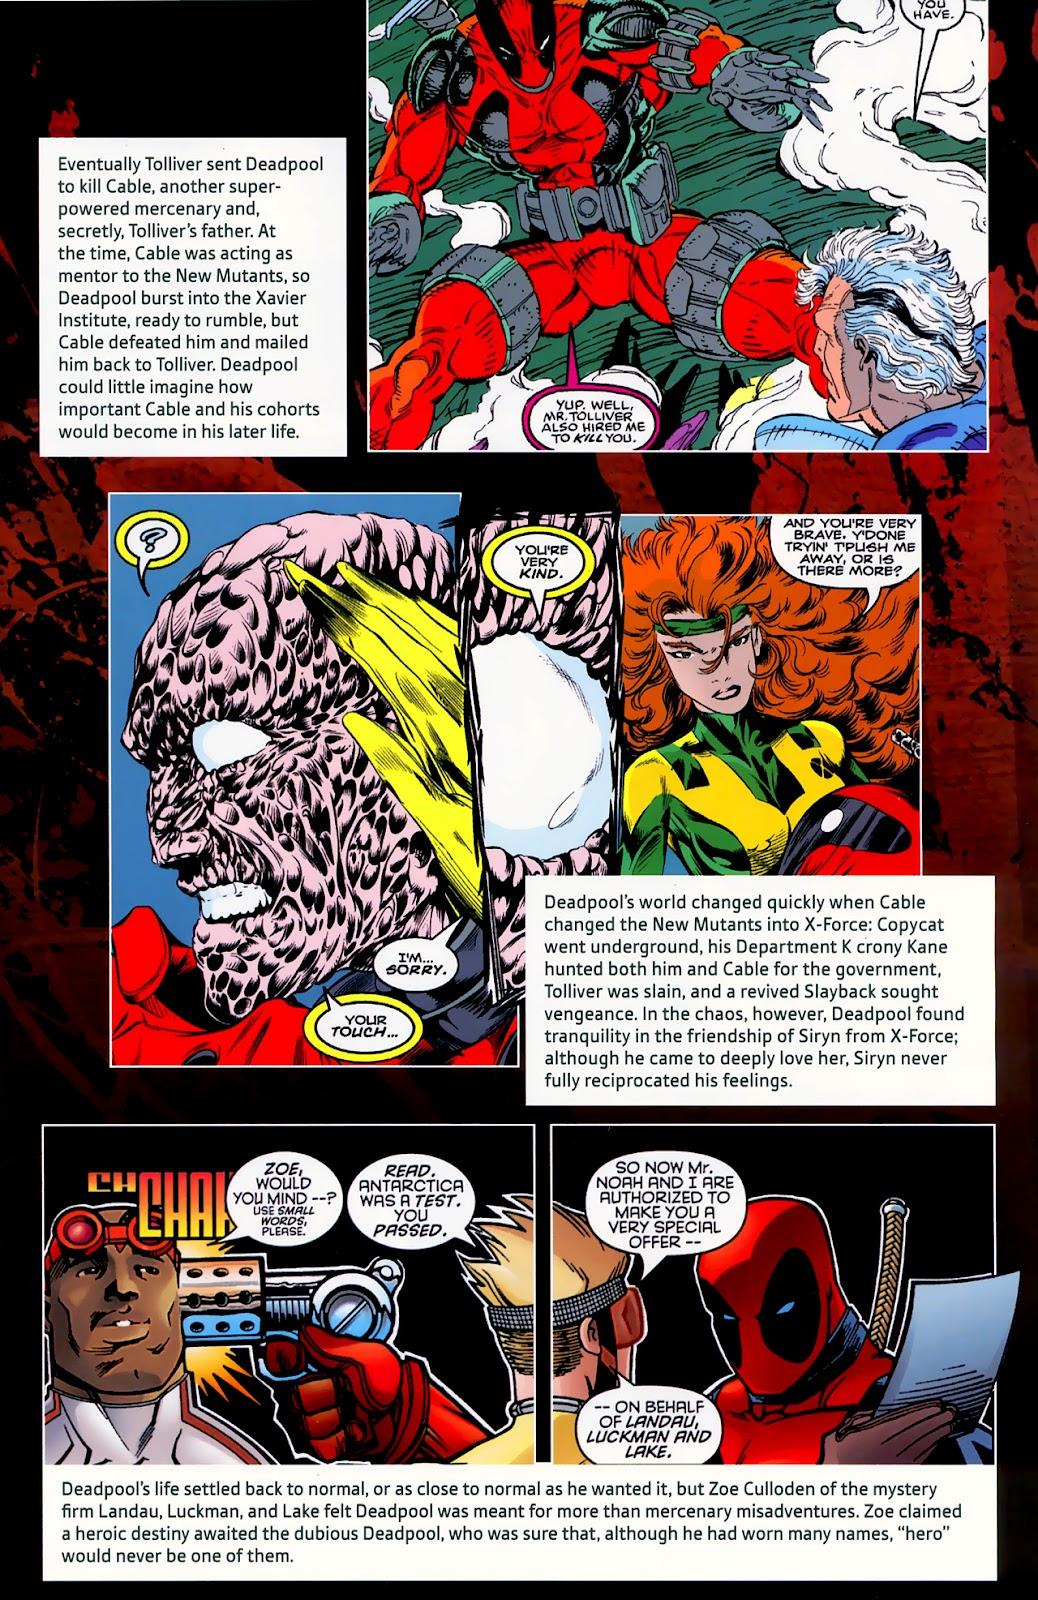 Read online Deadpool (2008) comic -  Issue #1 - 27